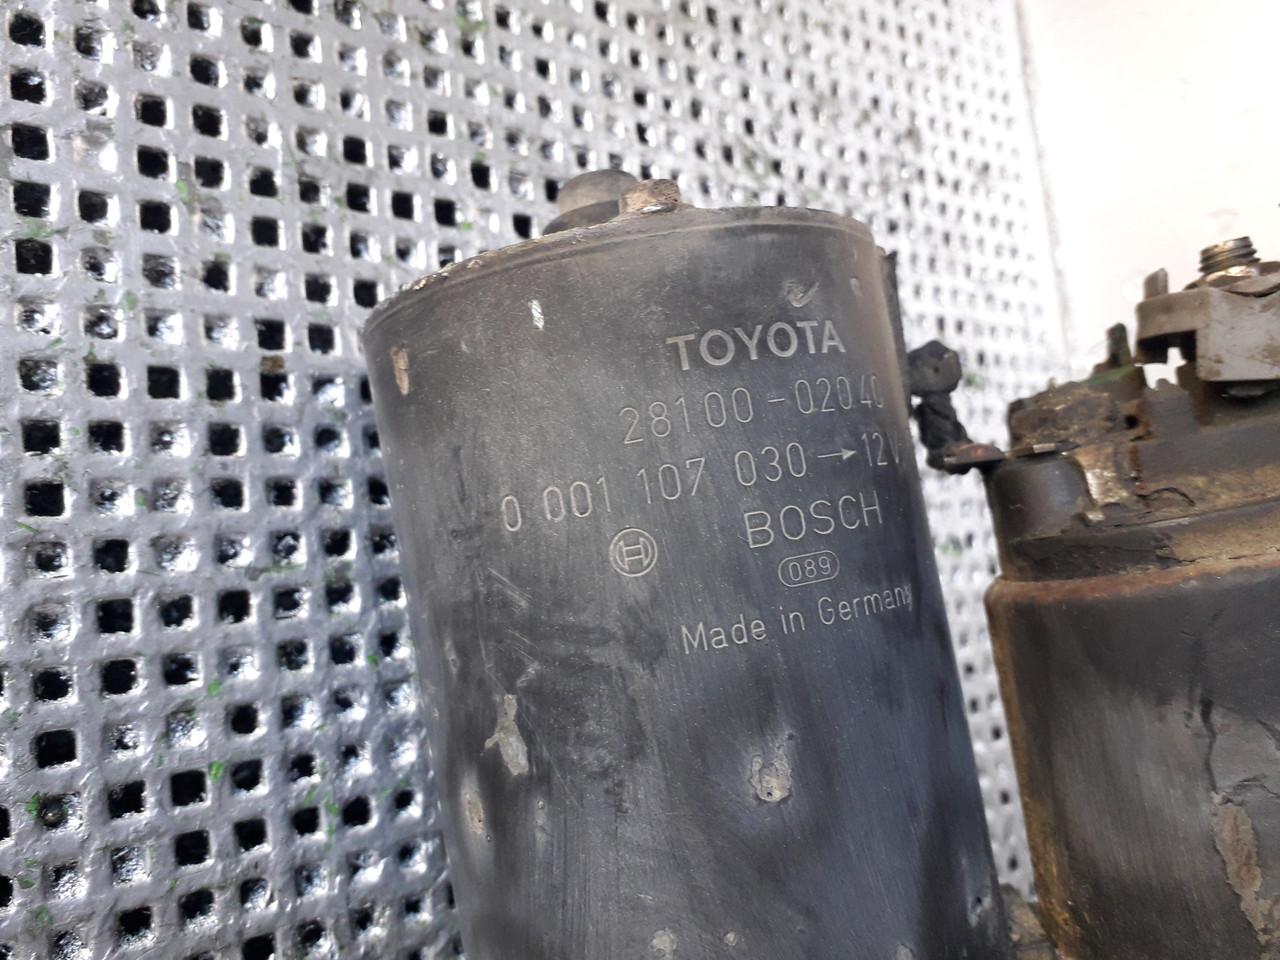 001107030 Стартер для Toyota Carina E Corolla 1.6